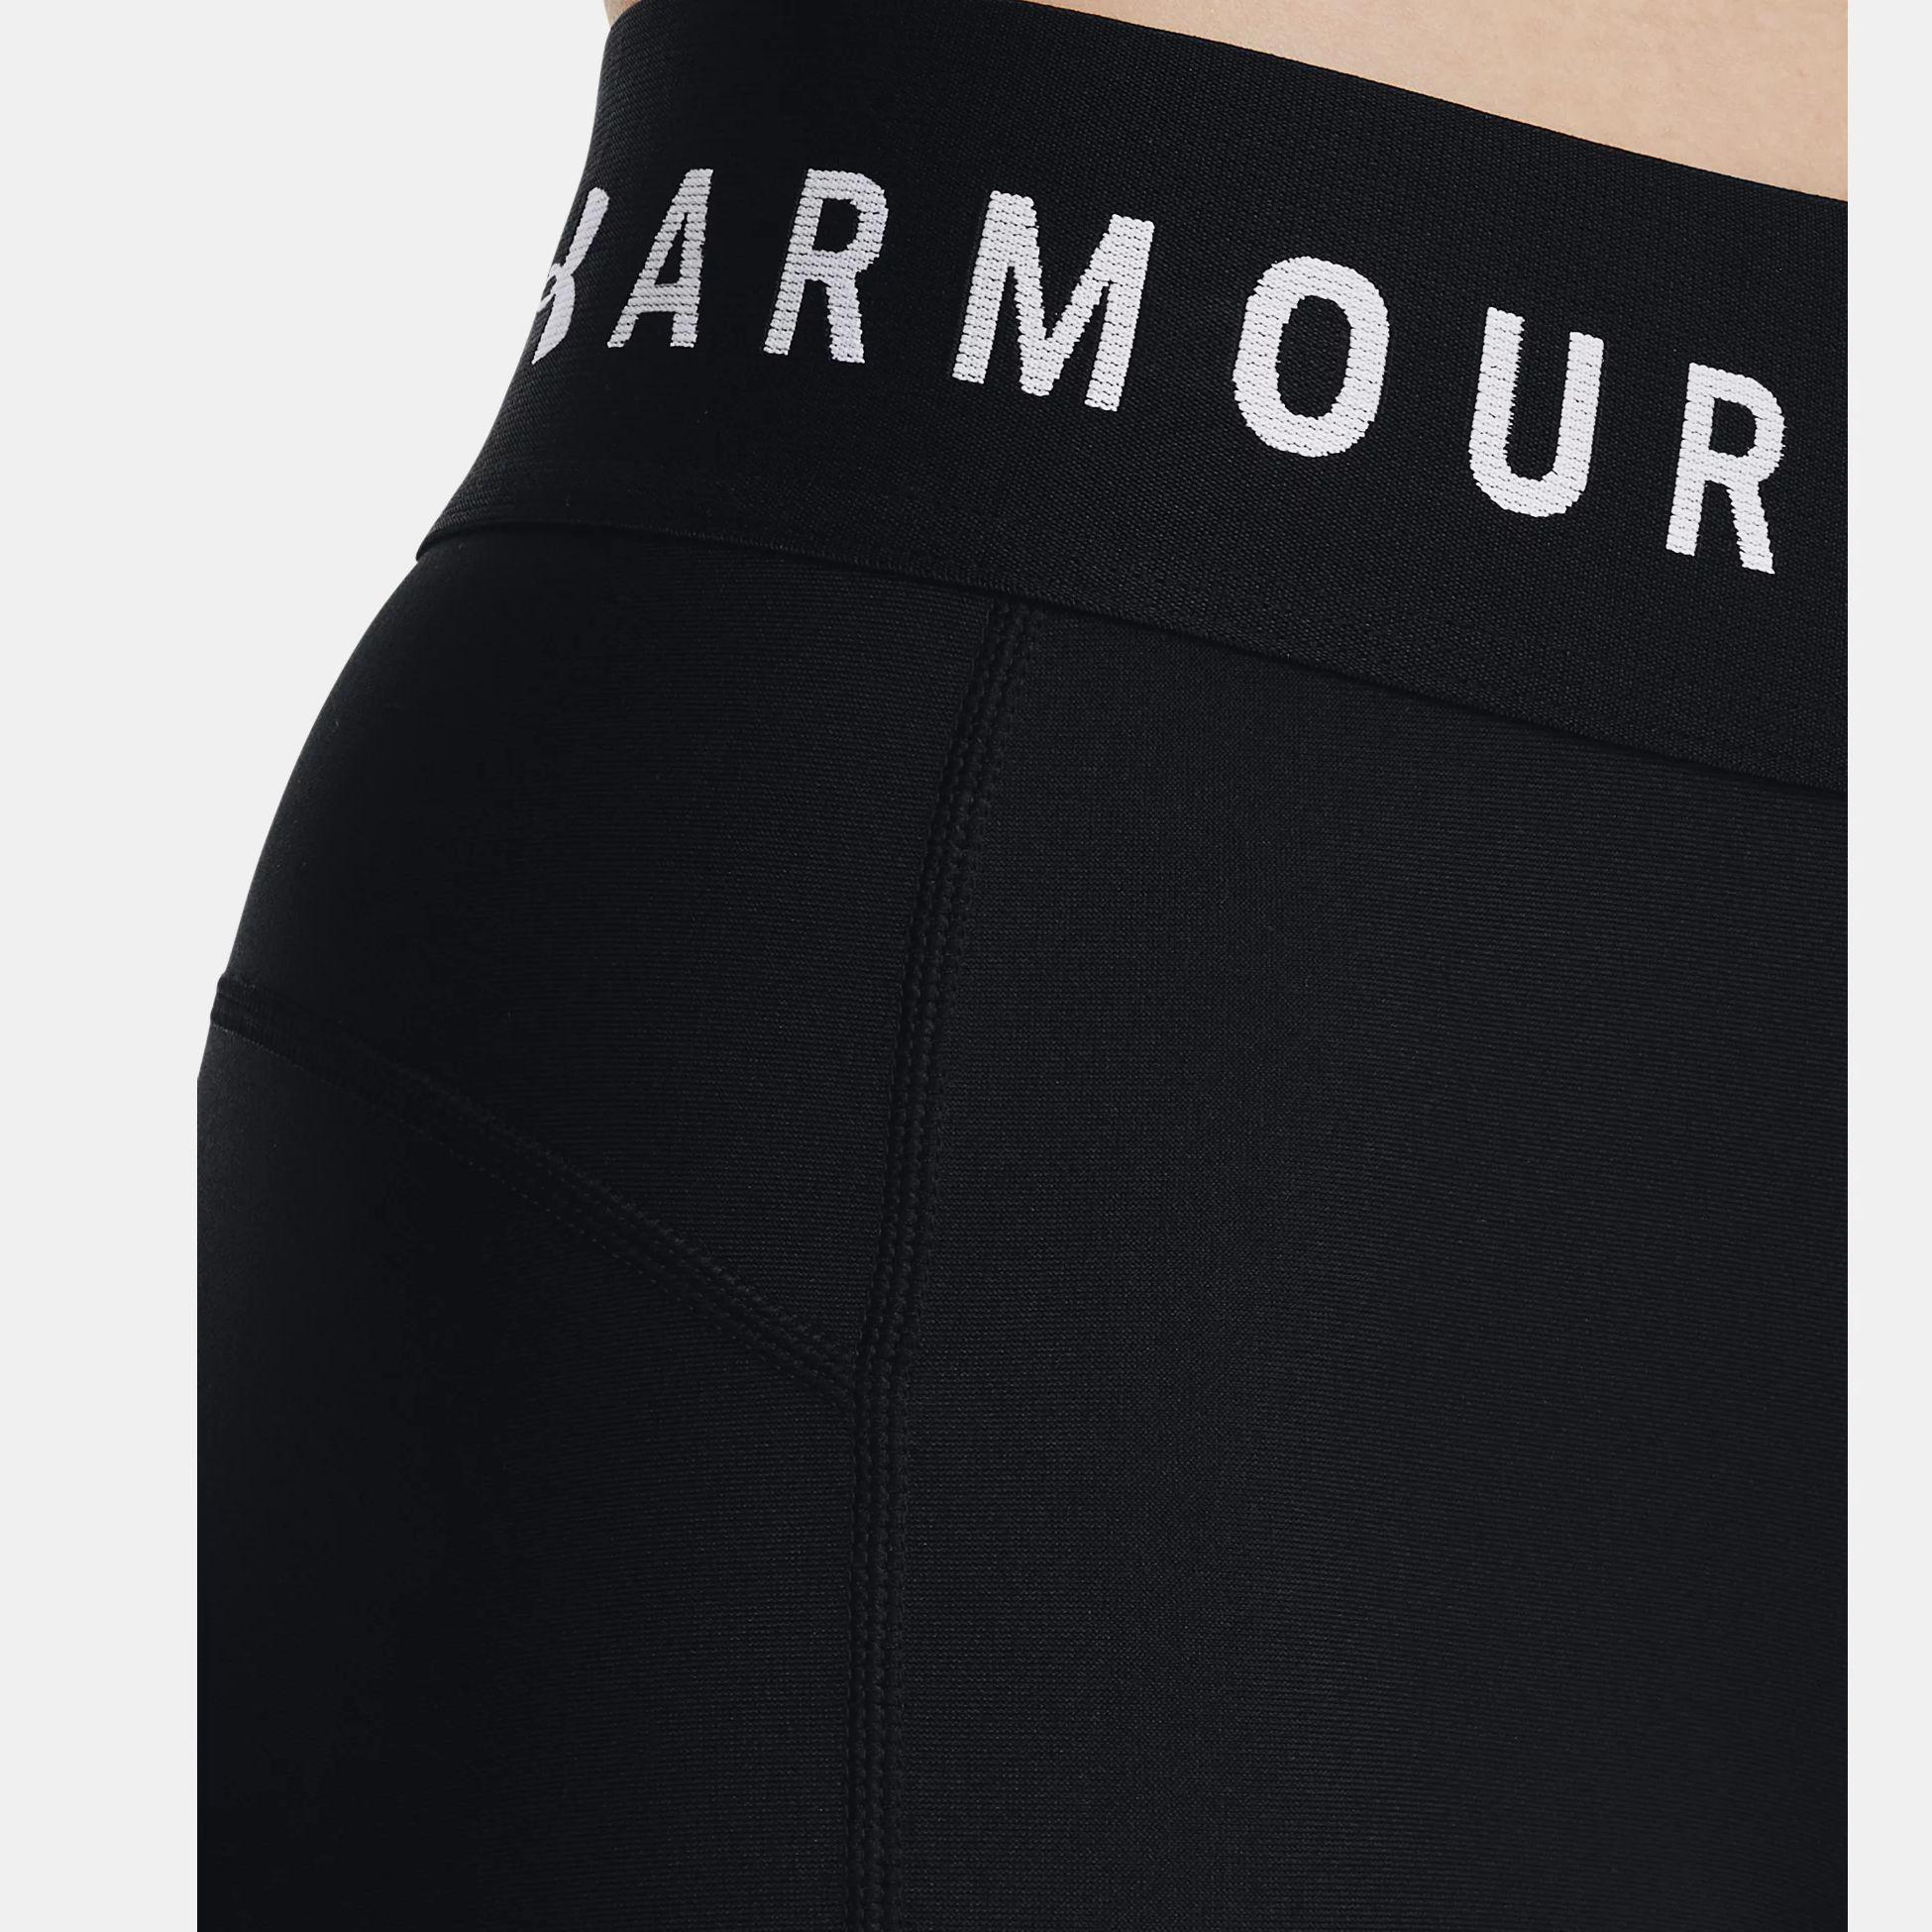 Îmbrăcăminte -  under armour Armour Branded WB Full-Length Leggings